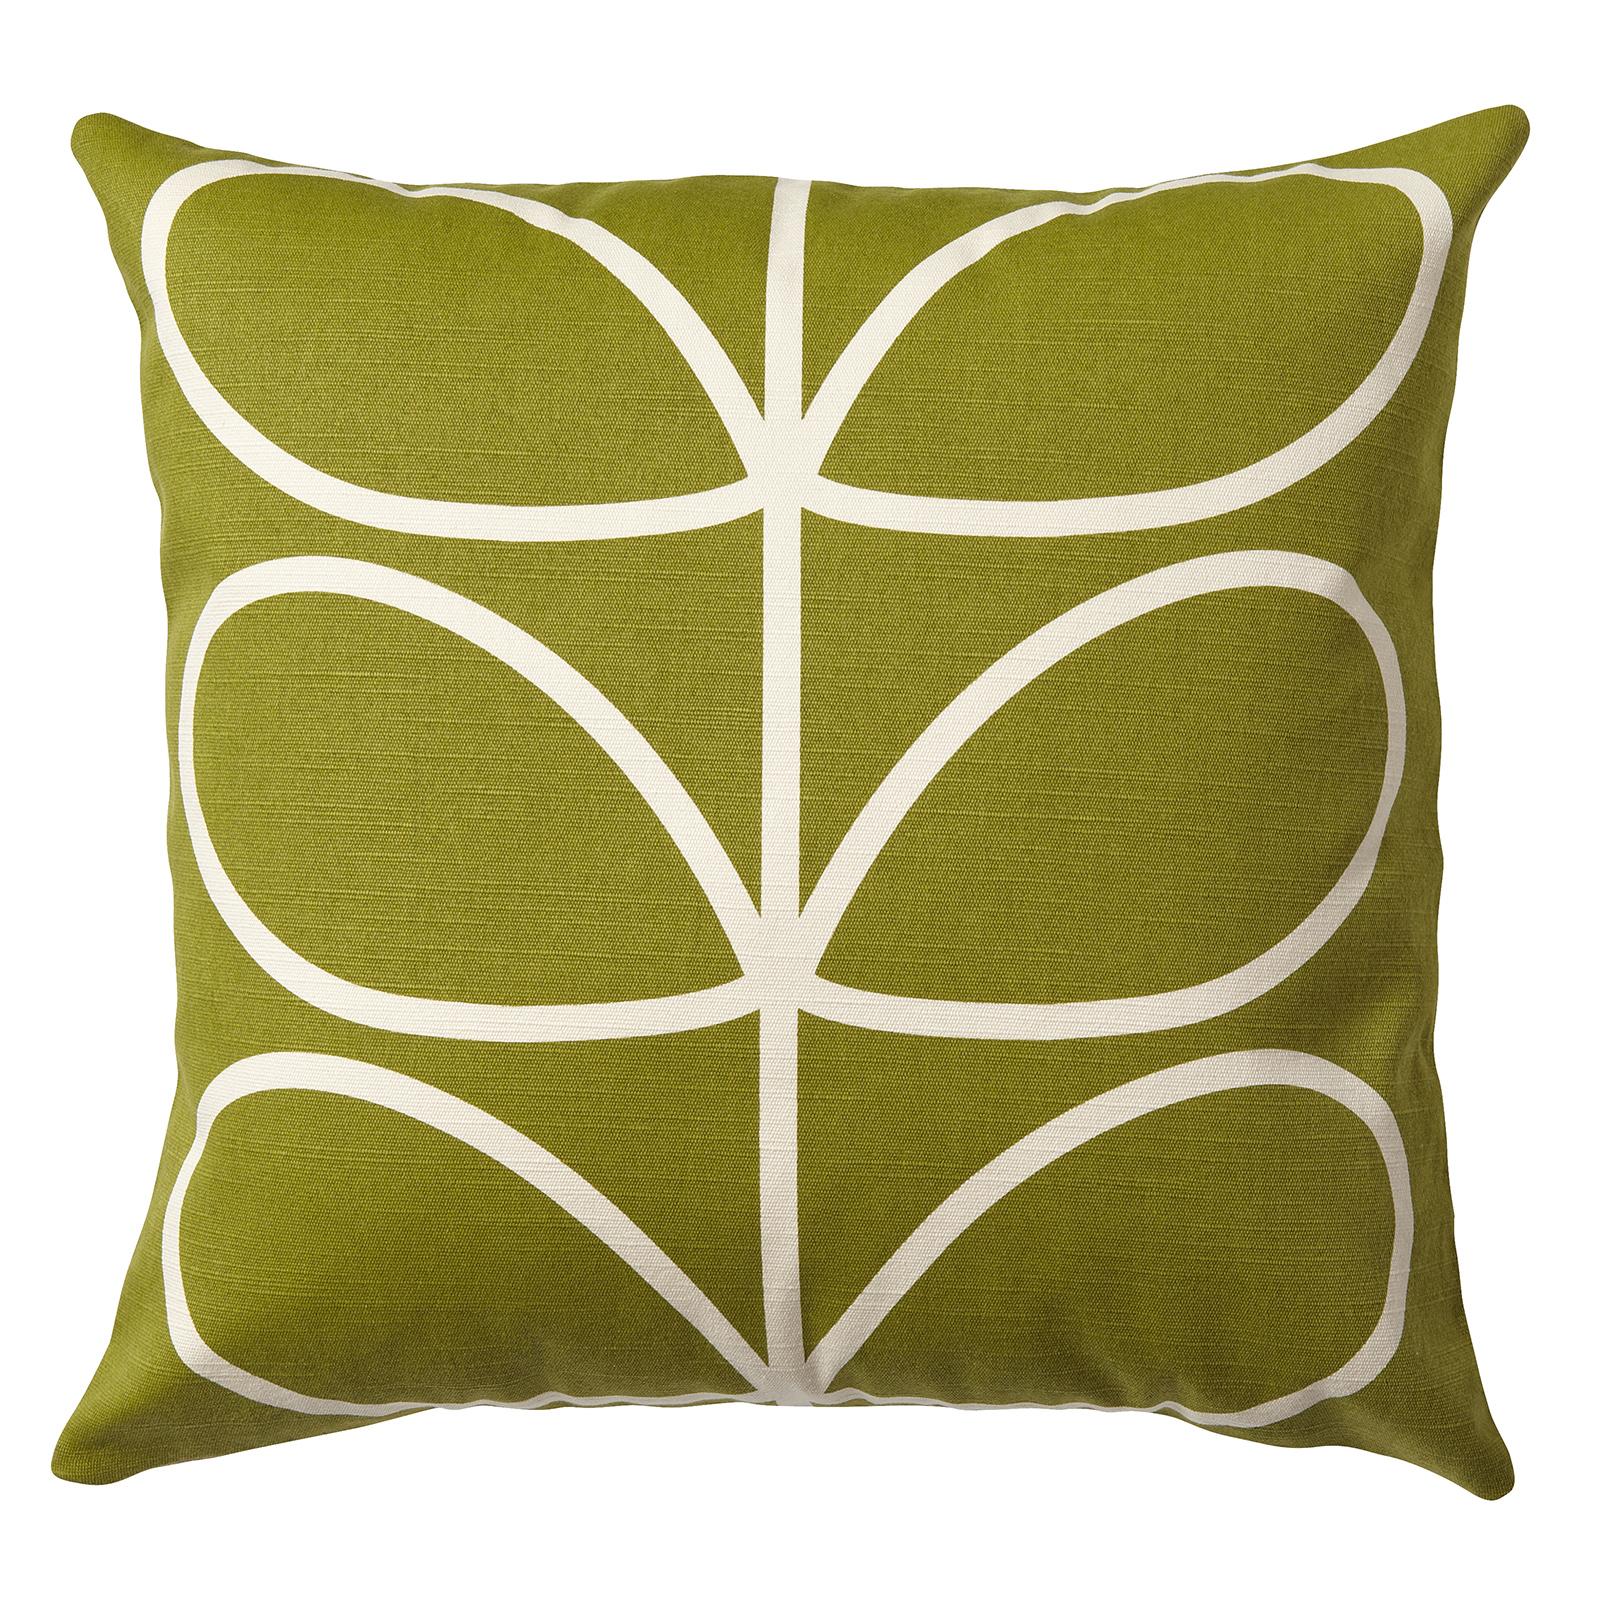 I Love Orla Kiely Orla Kiely Spotted Linear Stem Cushion